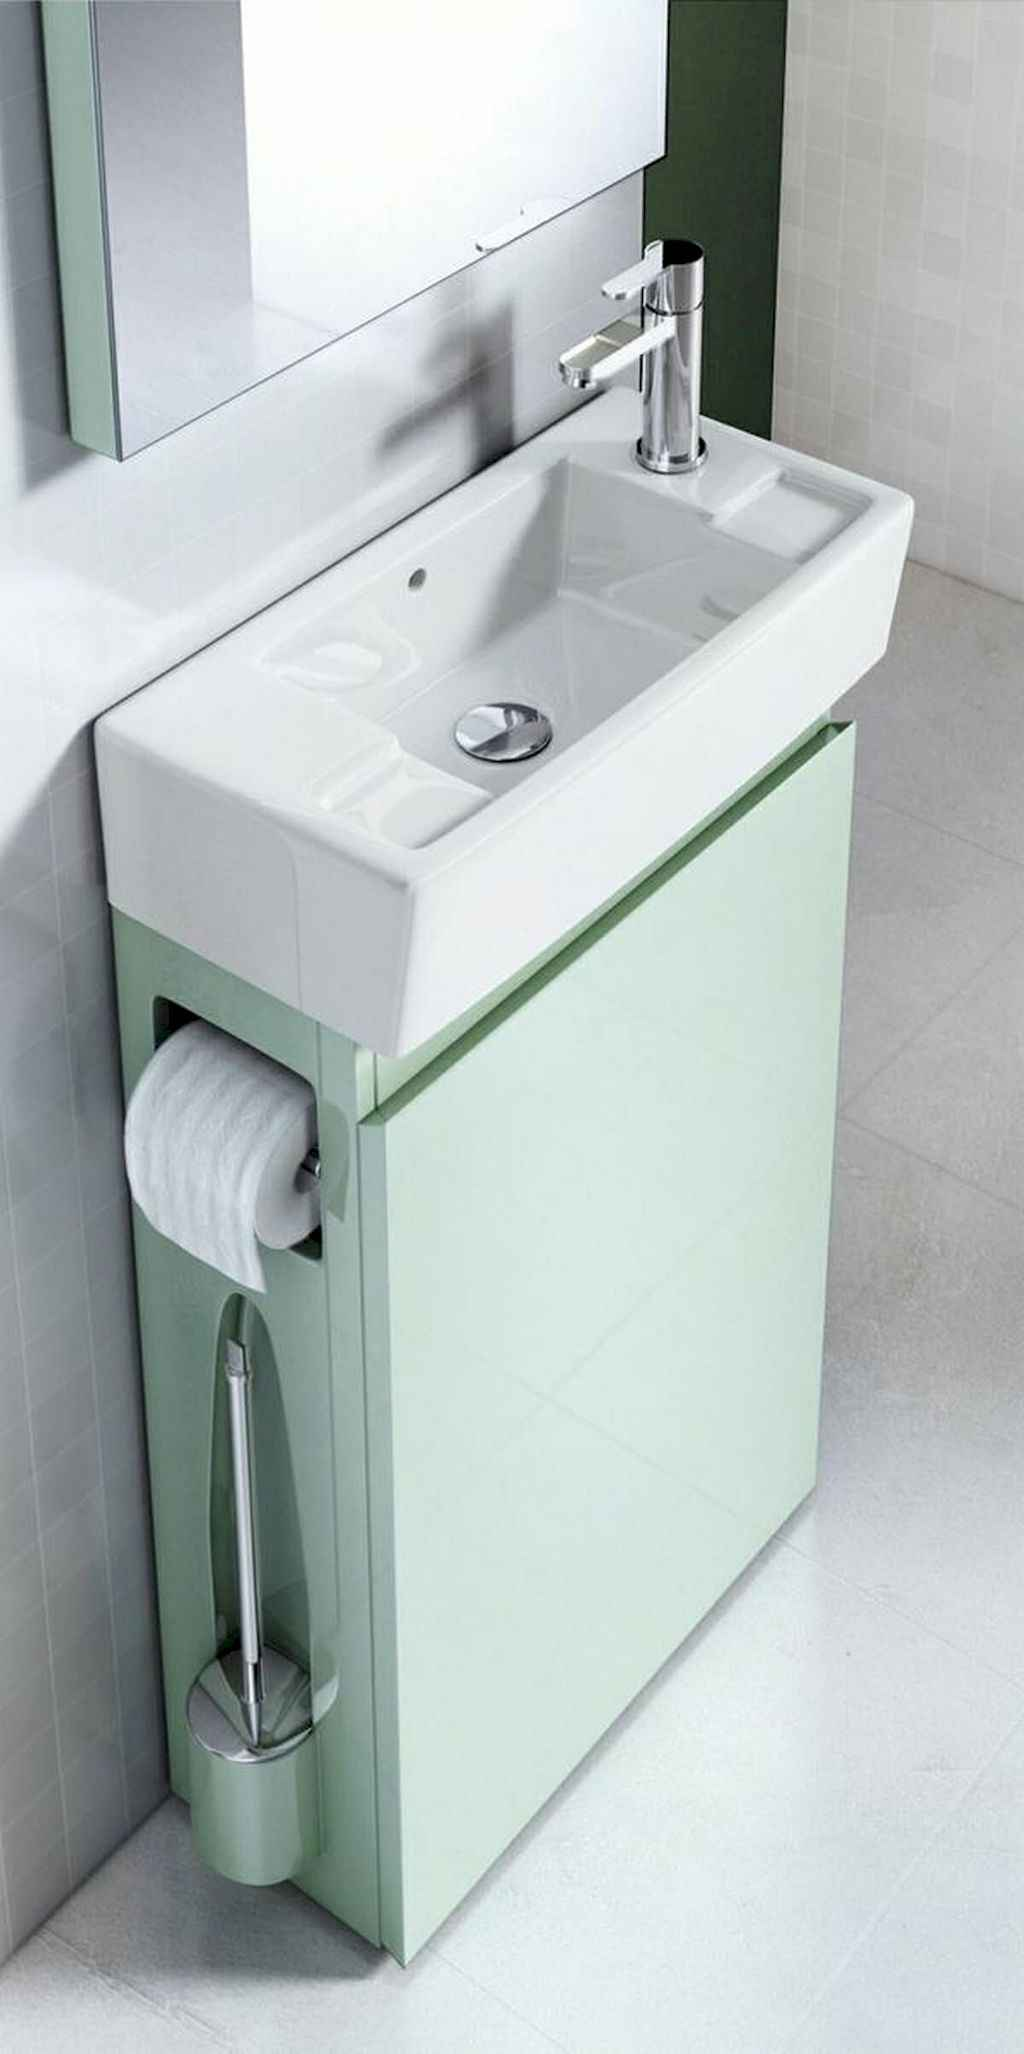 111 Brilliant Small Bathroom Remodel Ideas On A Budget (21)